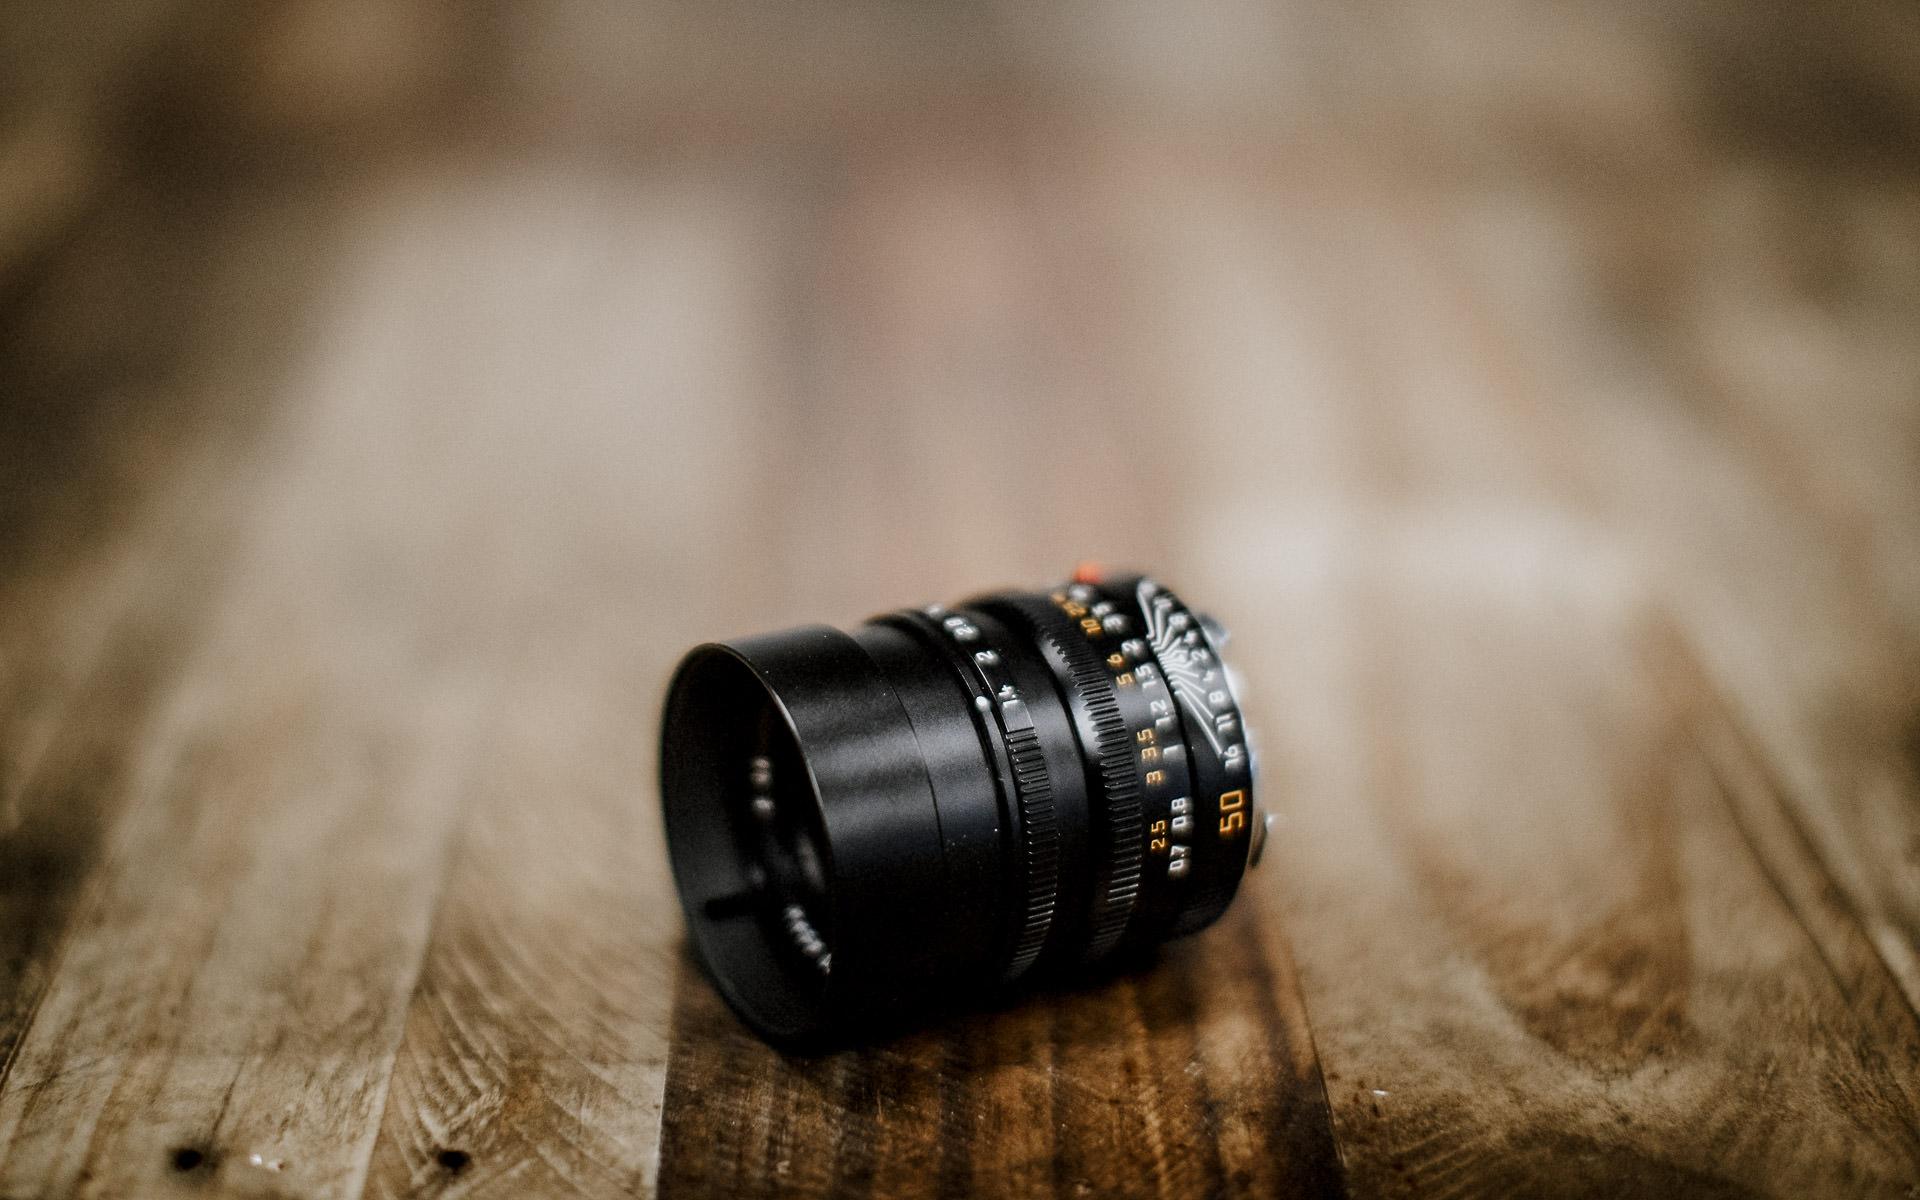 Leica 50mm Summilux f/1.4 ASPH